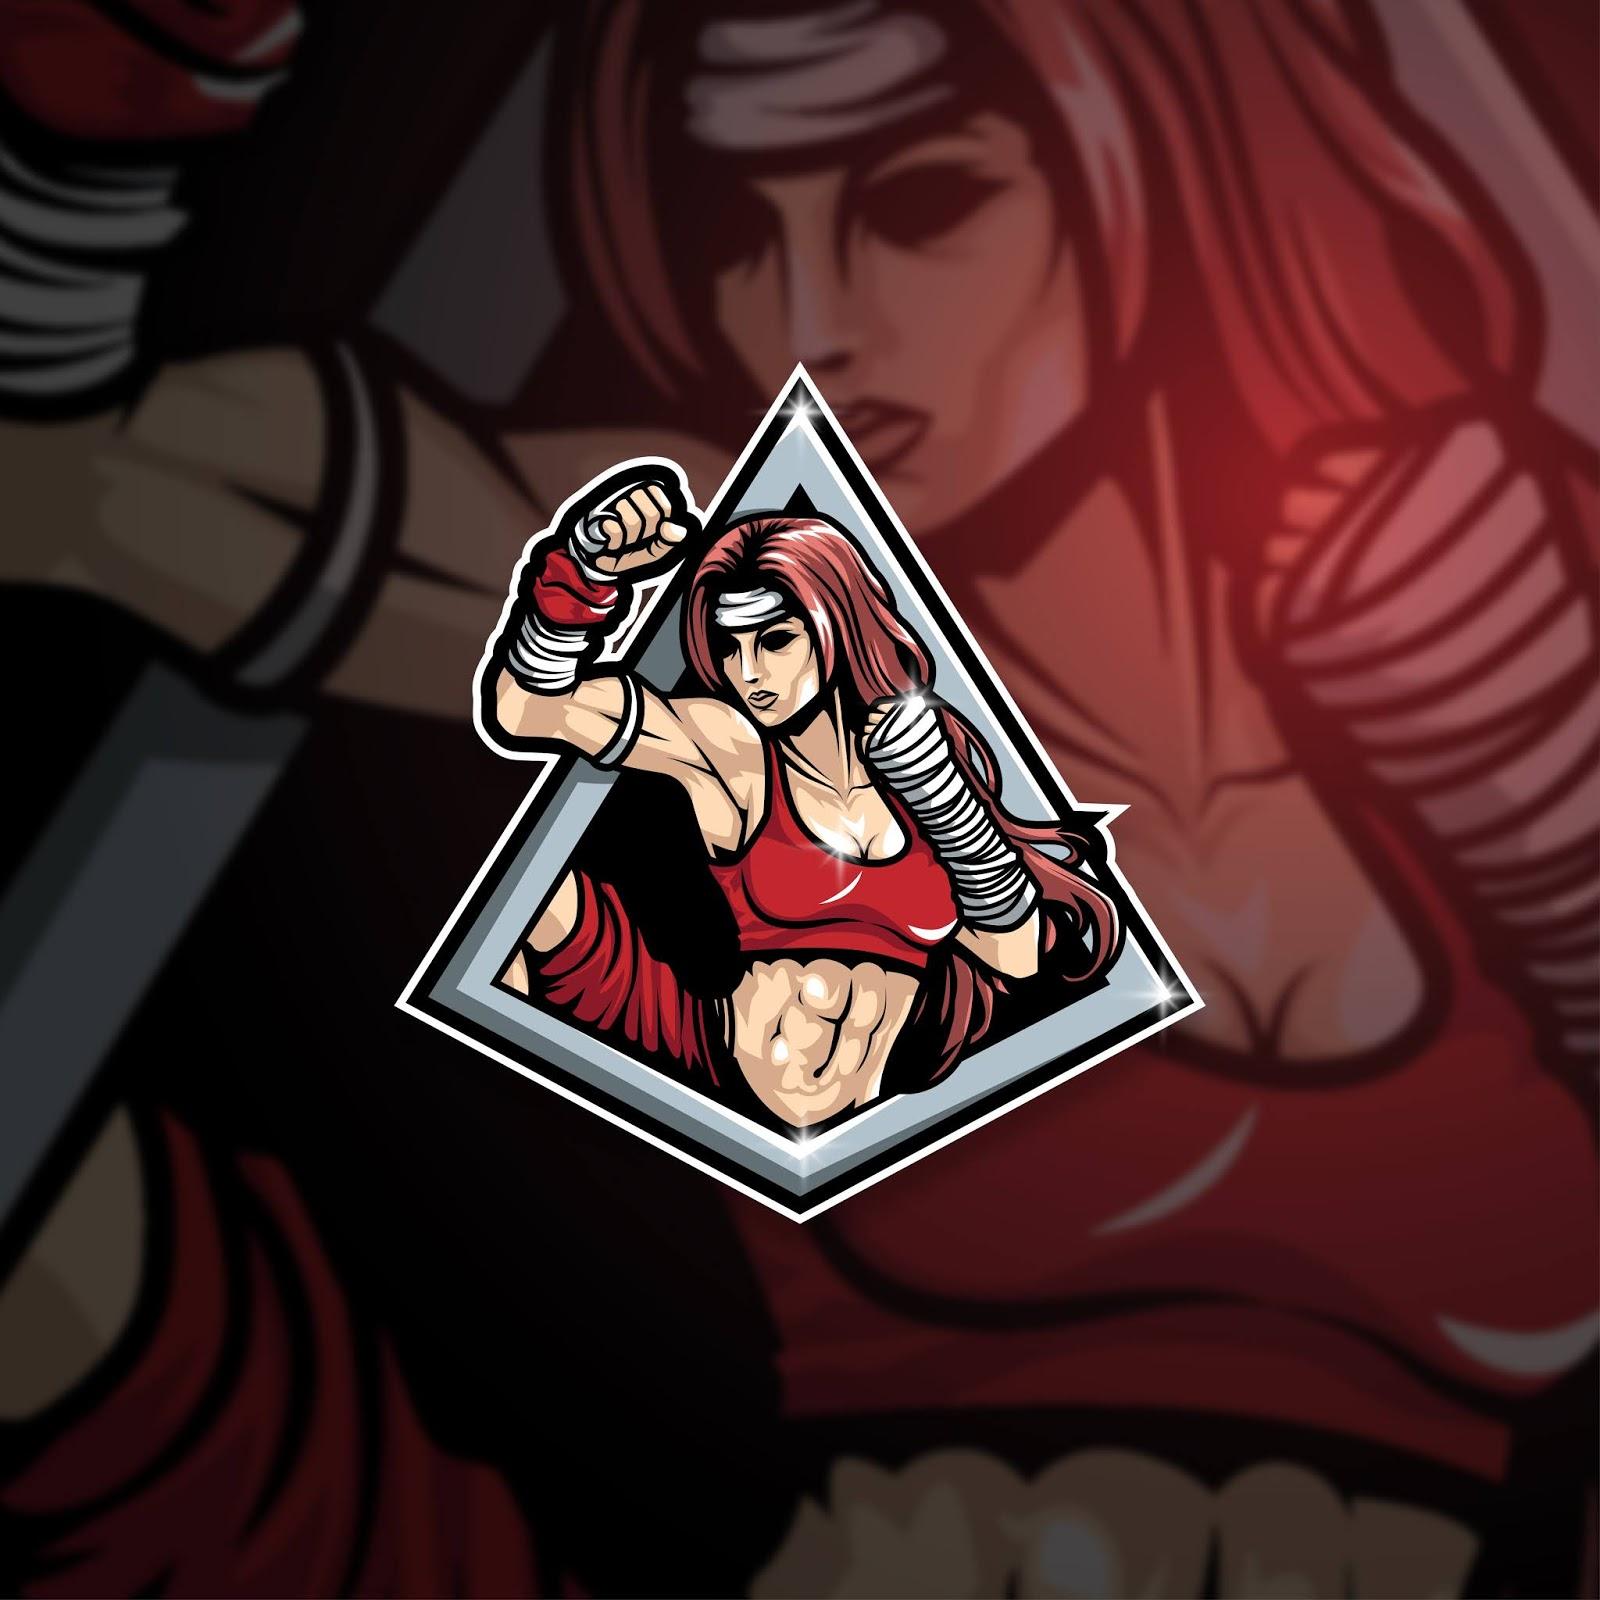 Esports Mascot Logo Team Master Muay Thai Free Download Vector CDR, AI, EPS and PNG Formats